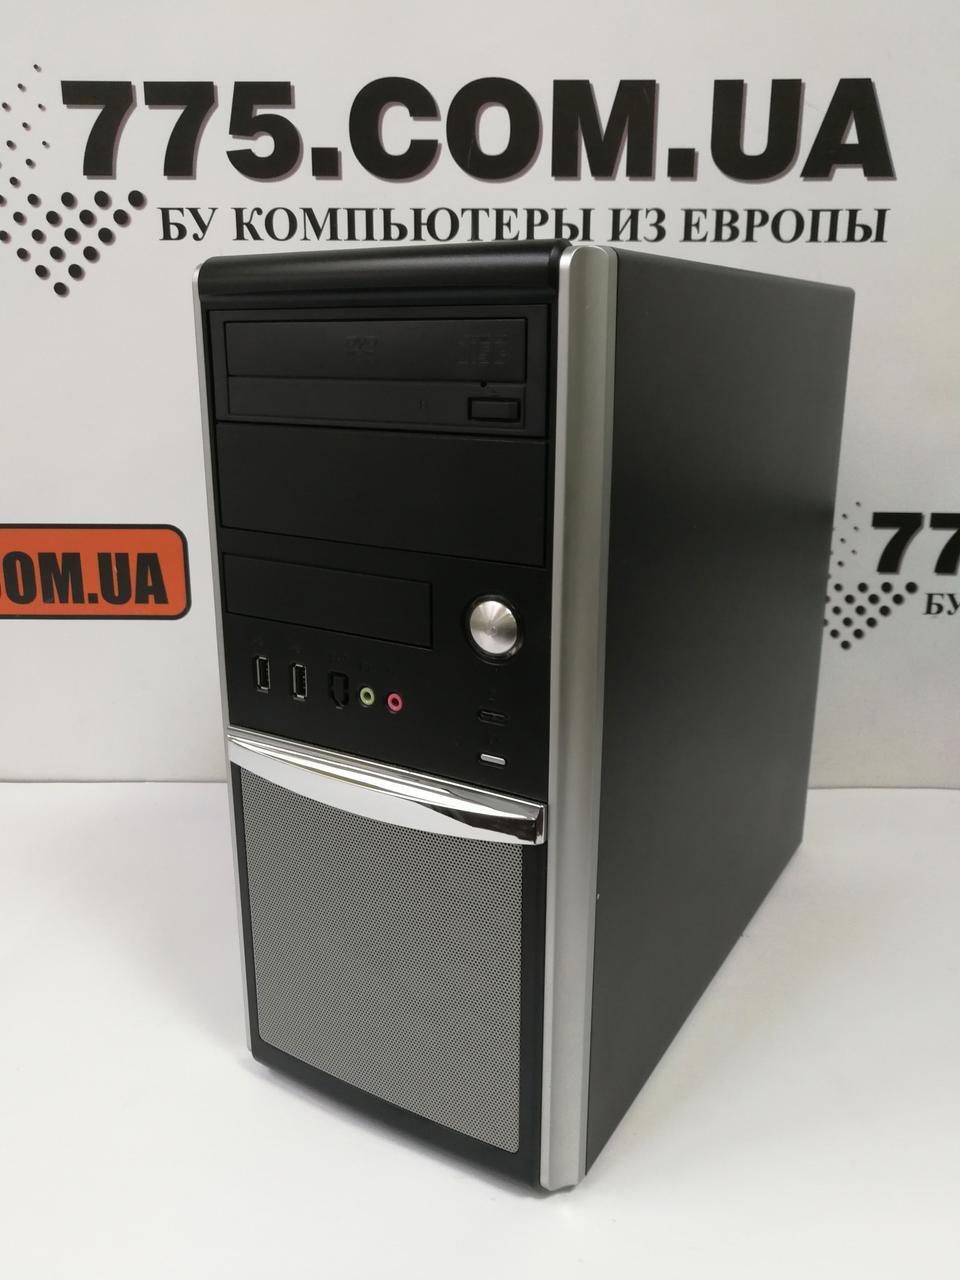 Компьютер EuroCom, Intel Core i5-650 3.46GHz, RAM 4ГБ, SSD 120ГБ, гарантия 12 месяцев